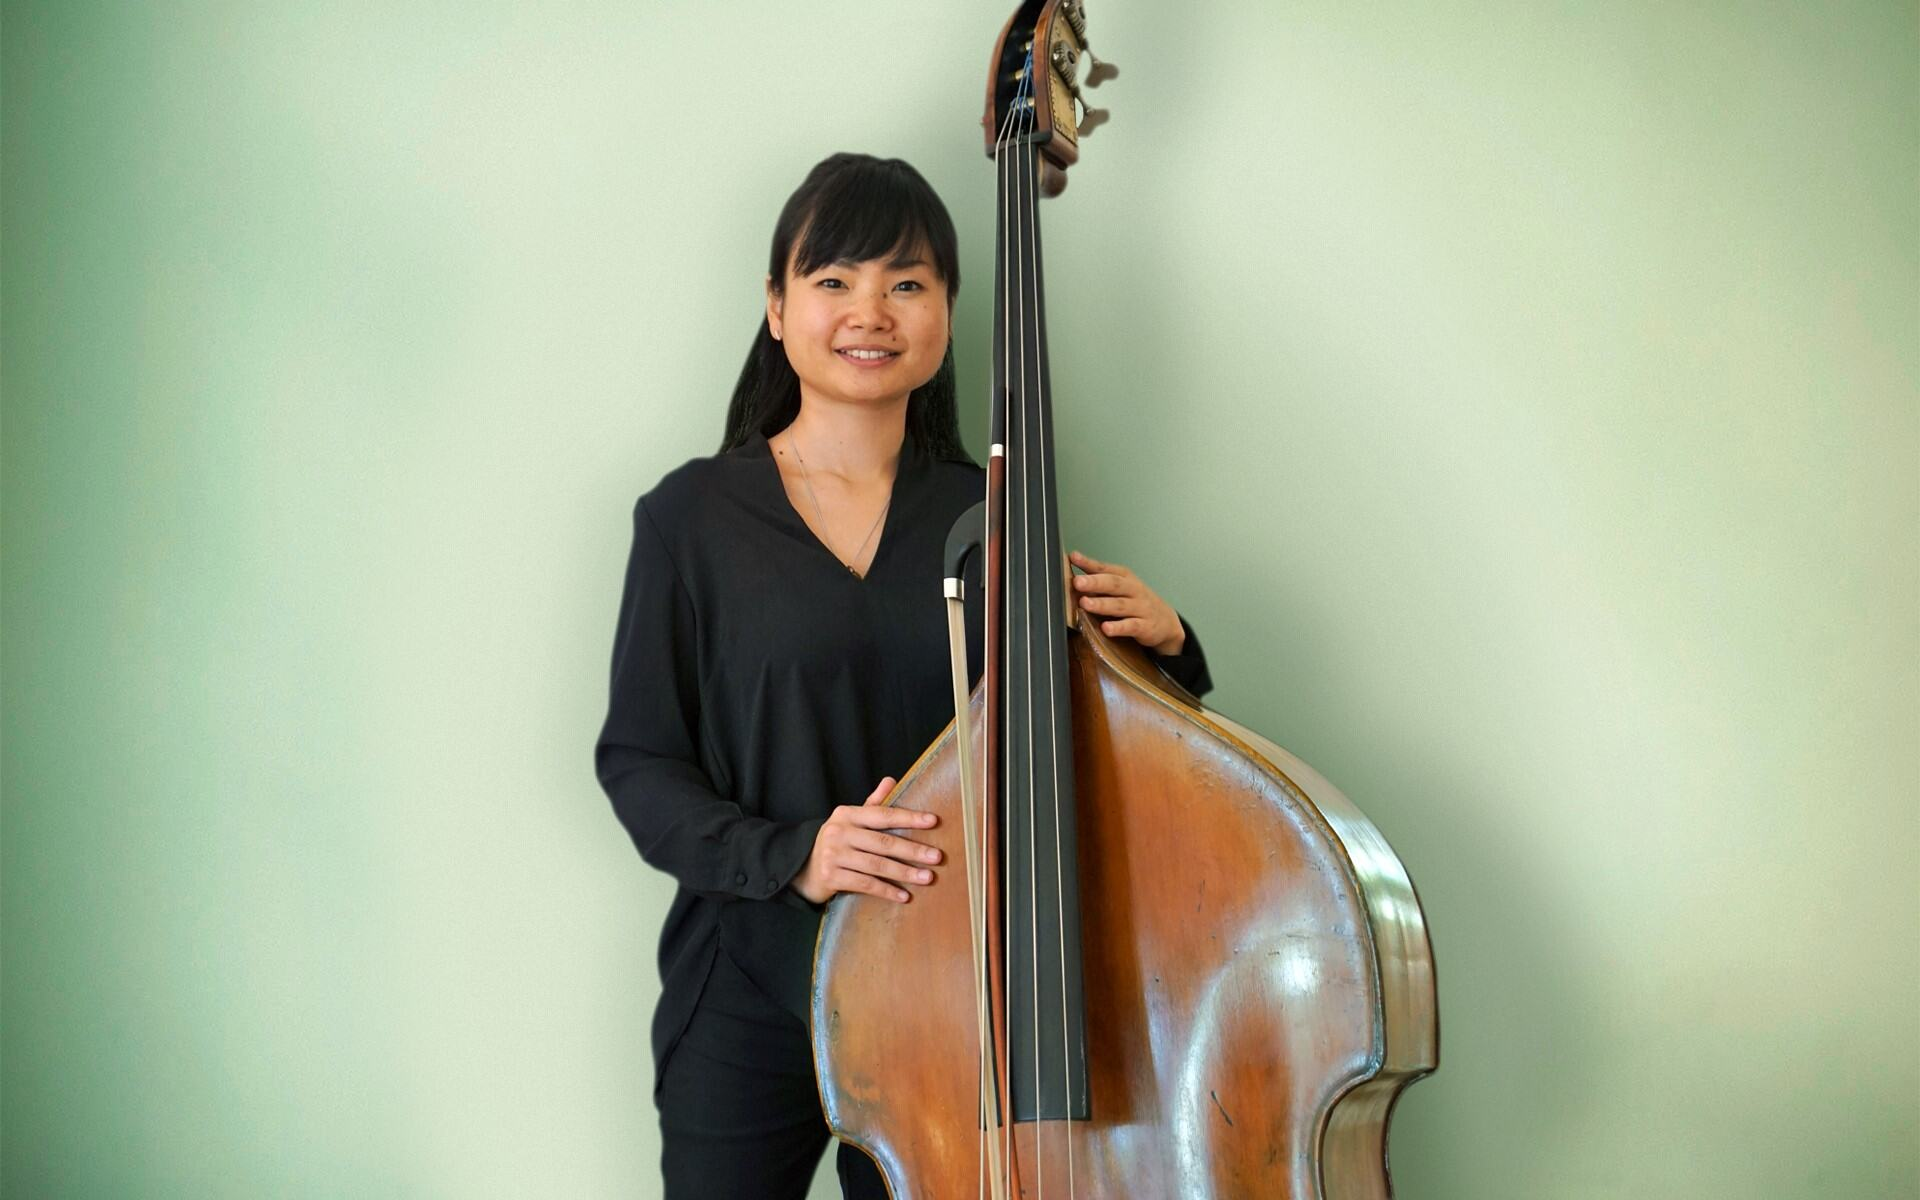 Shoko Tanaka, Mitglied der Staatsbad Philharmonie Kissingen